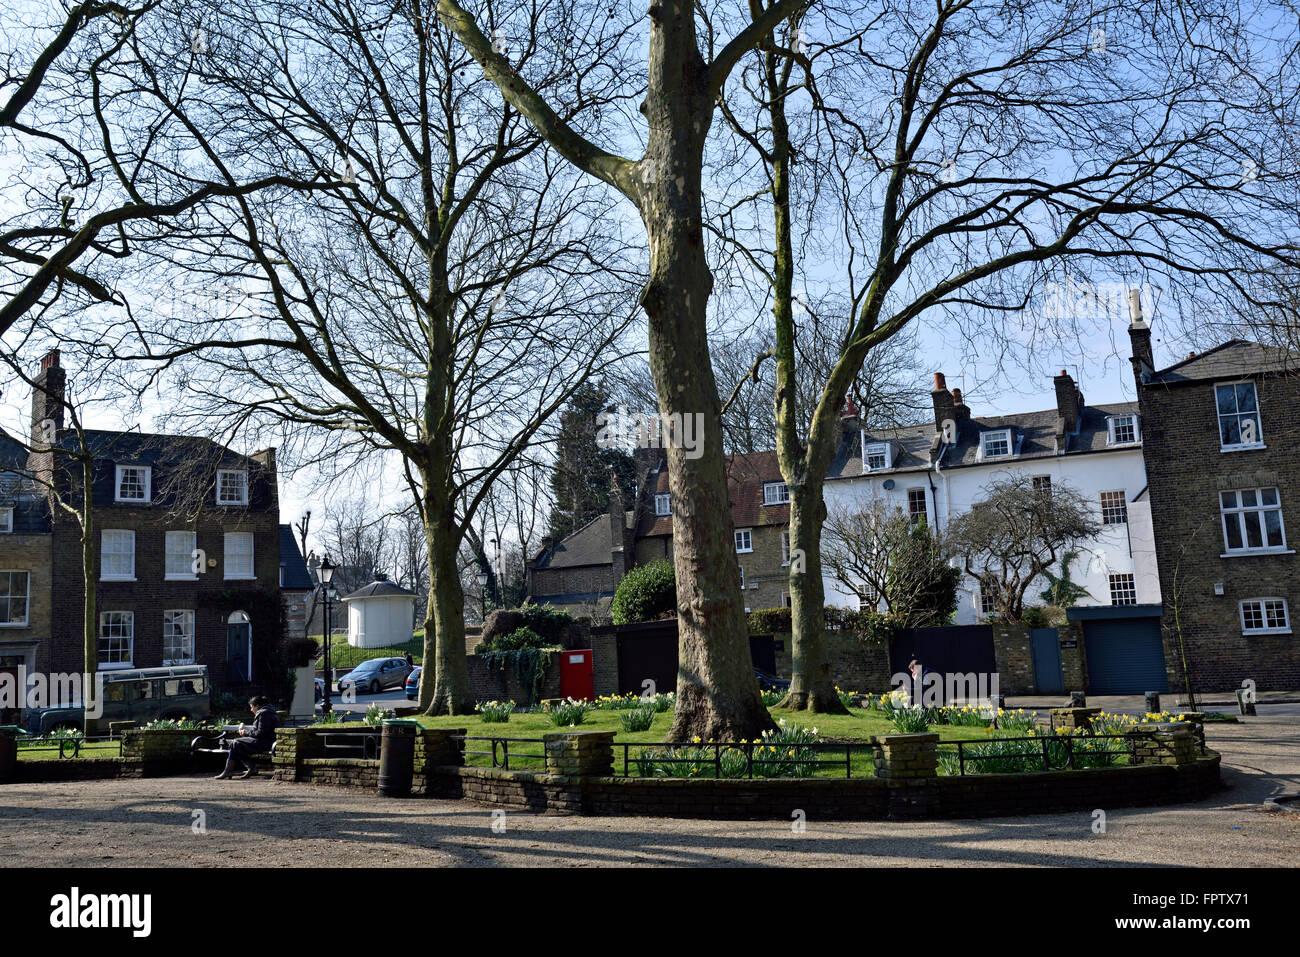 Pond Square in Spring, Highgate Village London England Britain UK Stock Photo